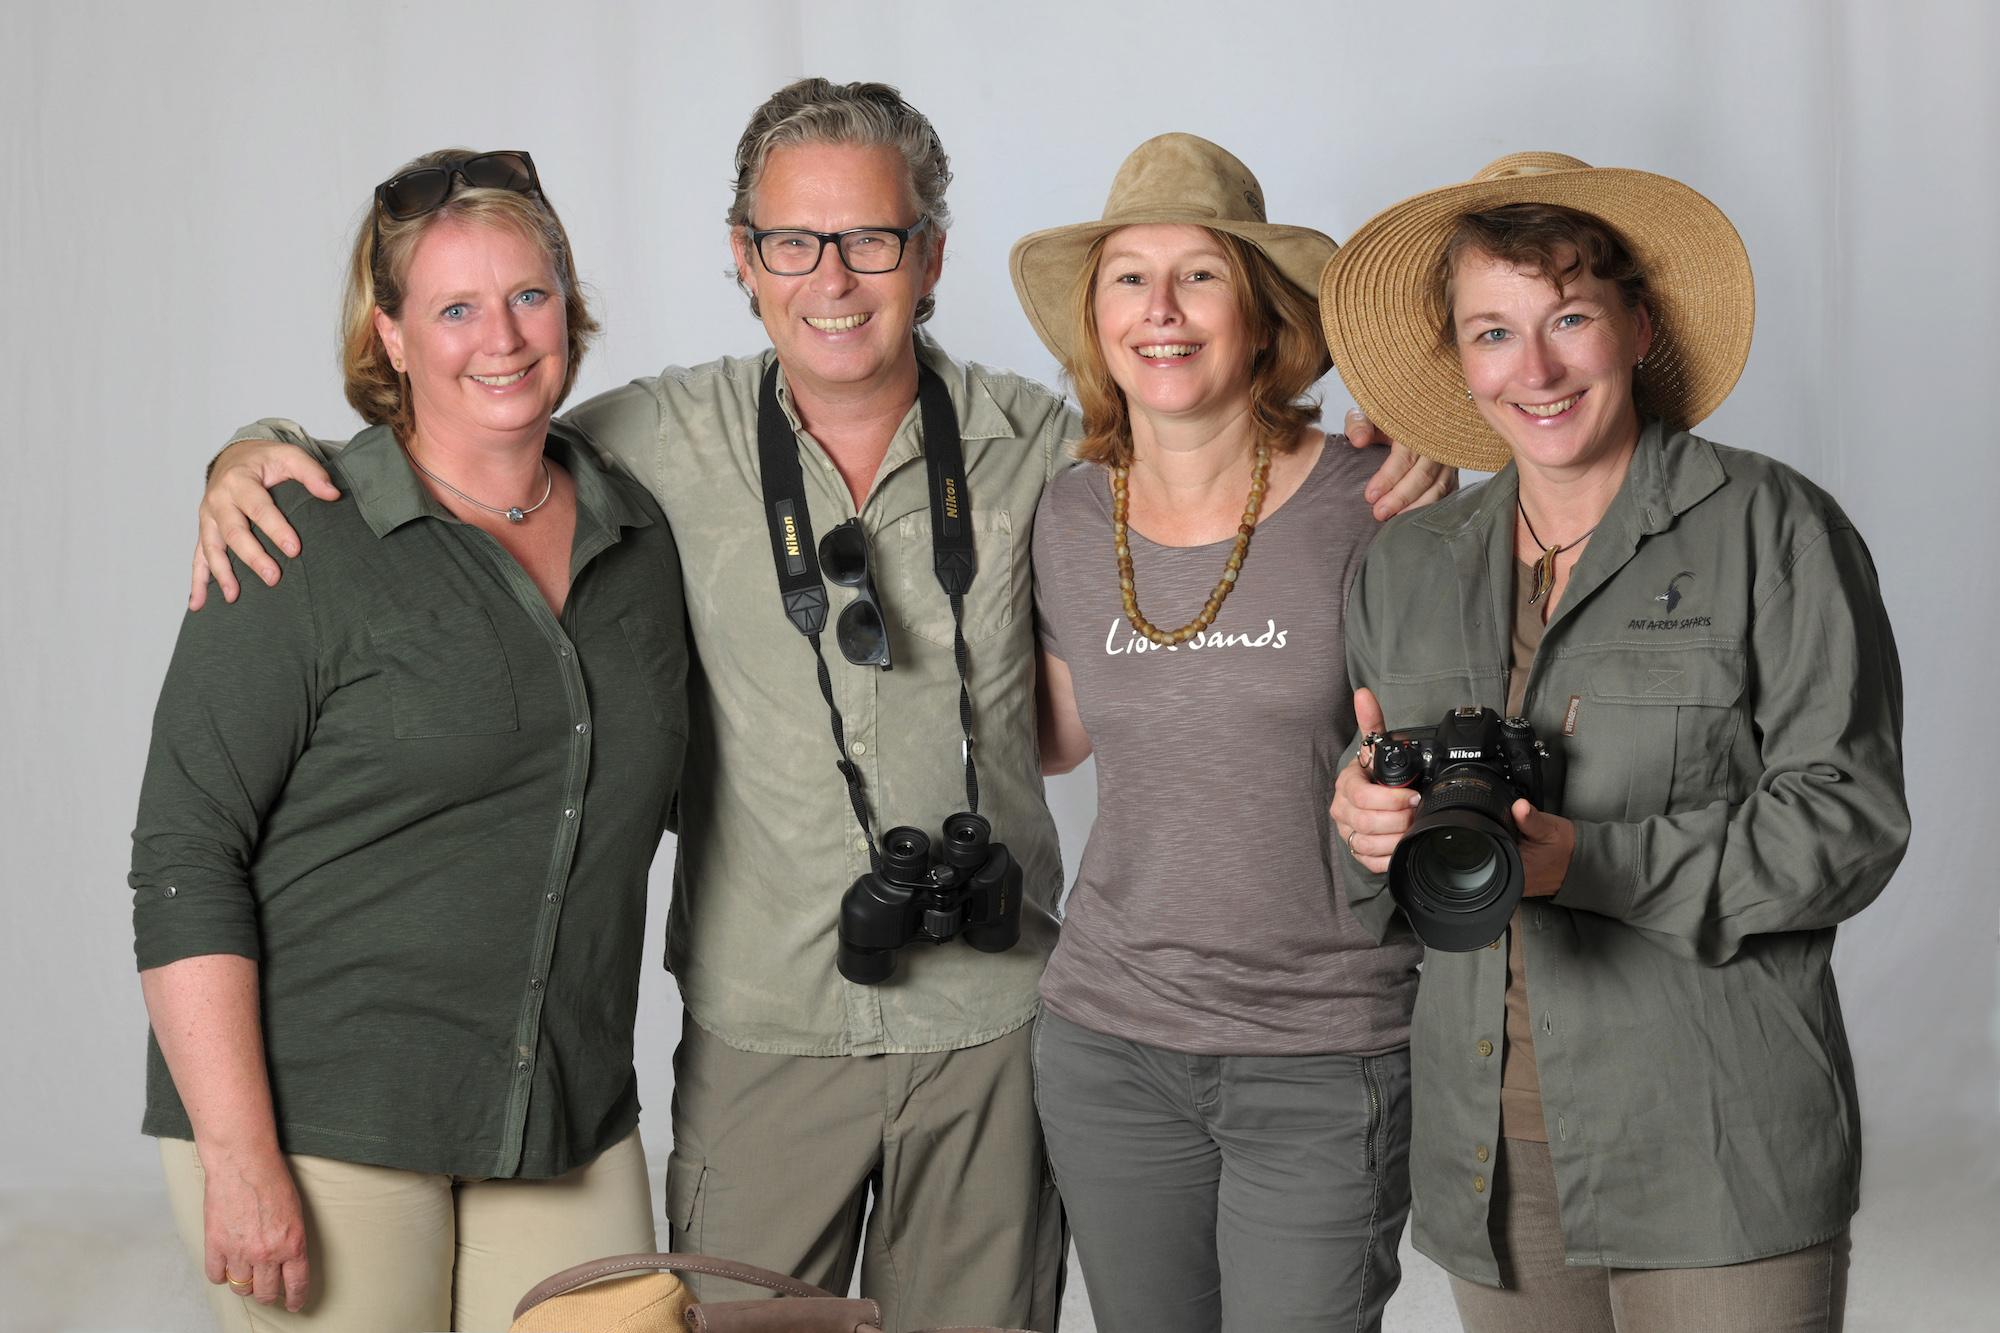 luxus safari Reisebüro von daacke